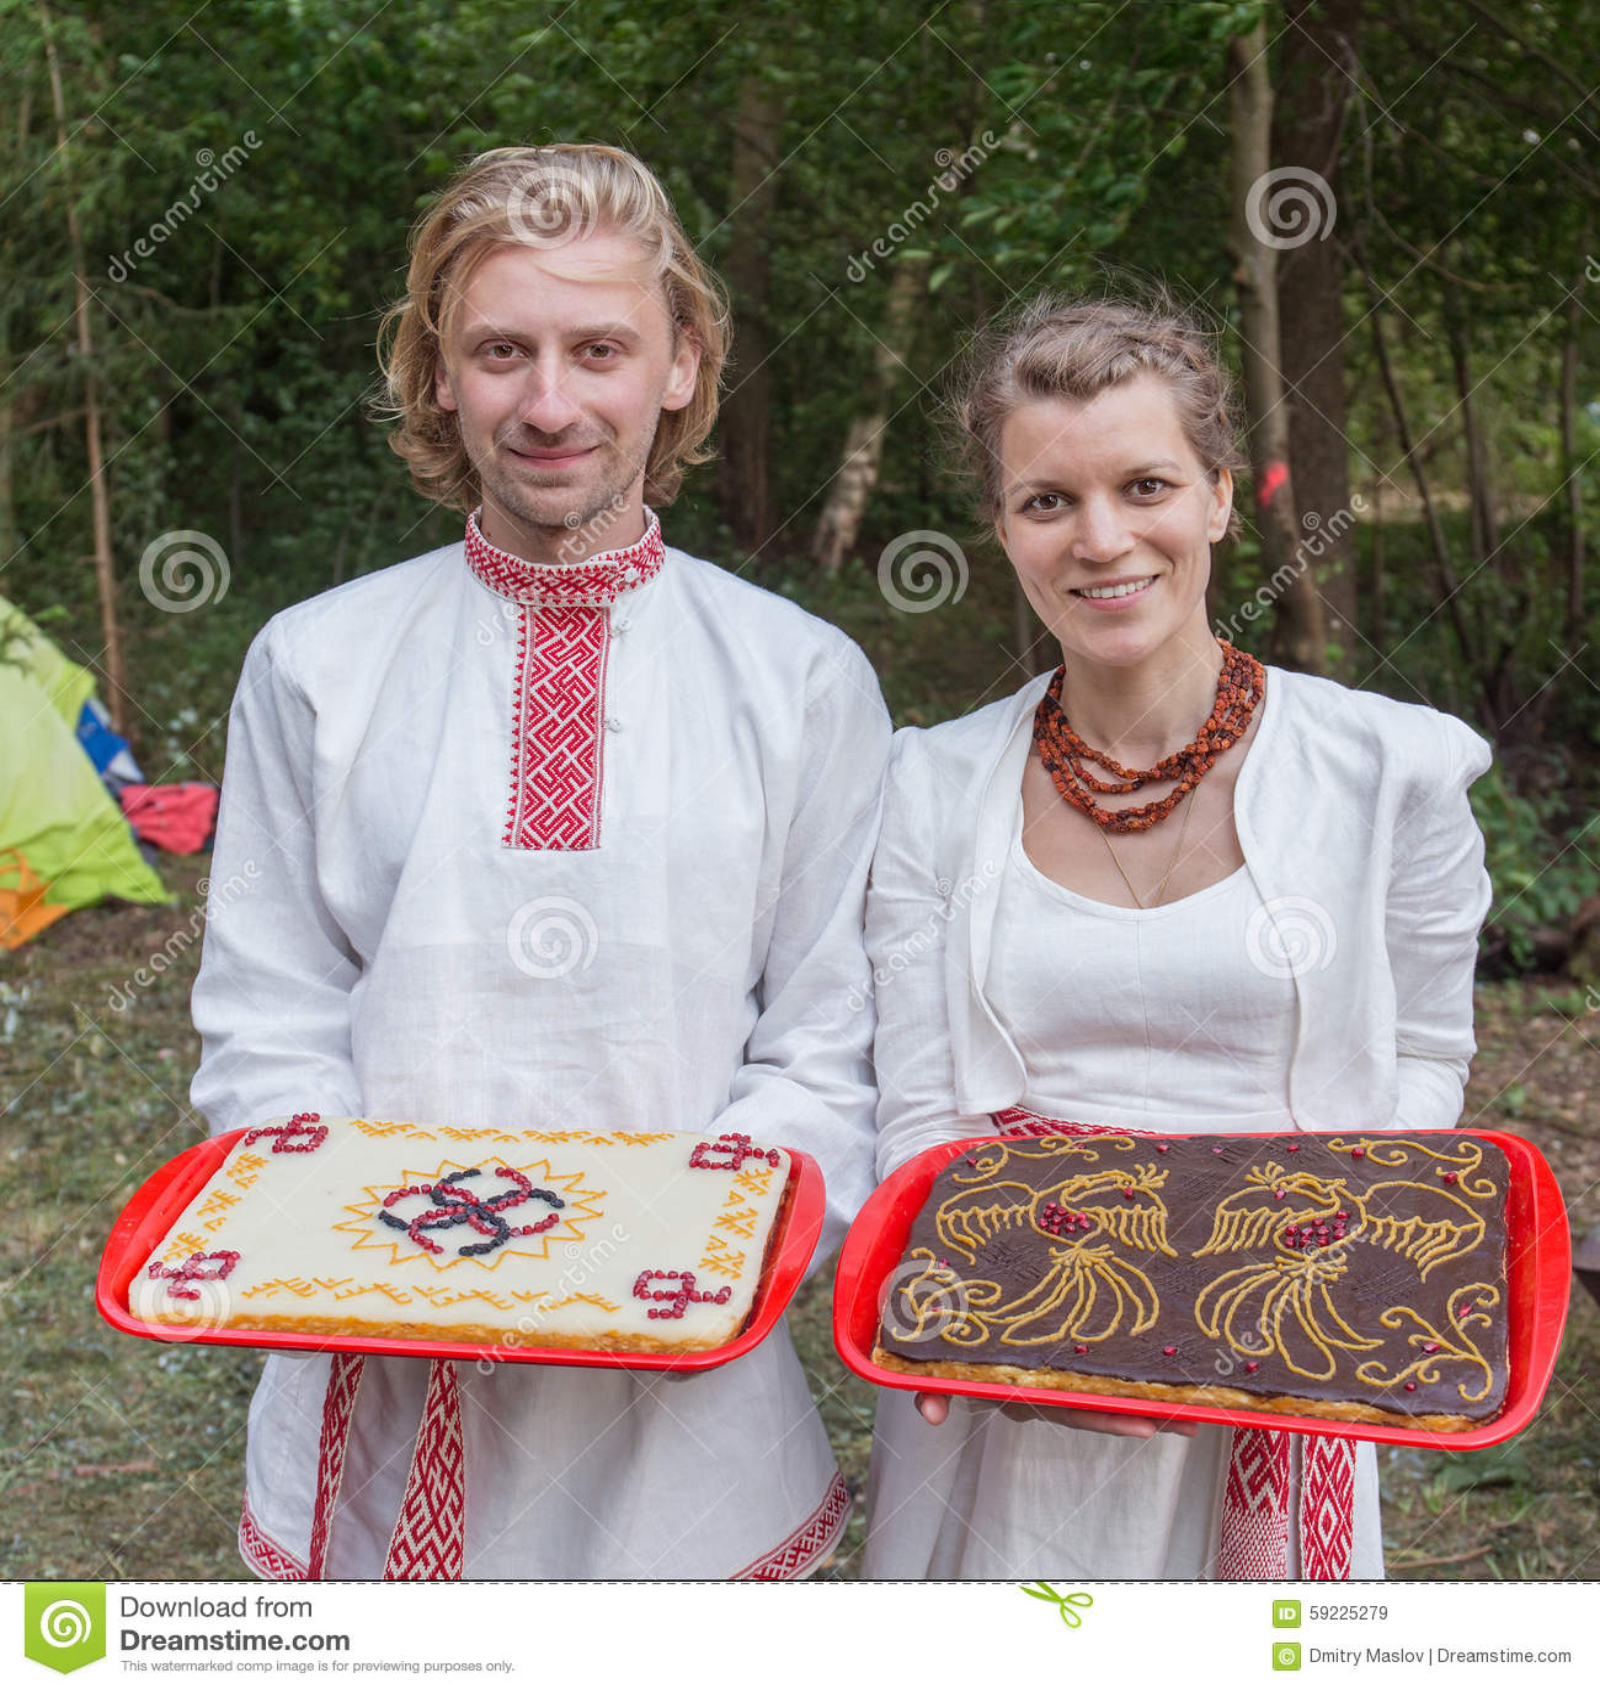 Download Pasteles de bodas imagen de archivo. Imagen de culturas - 59225279